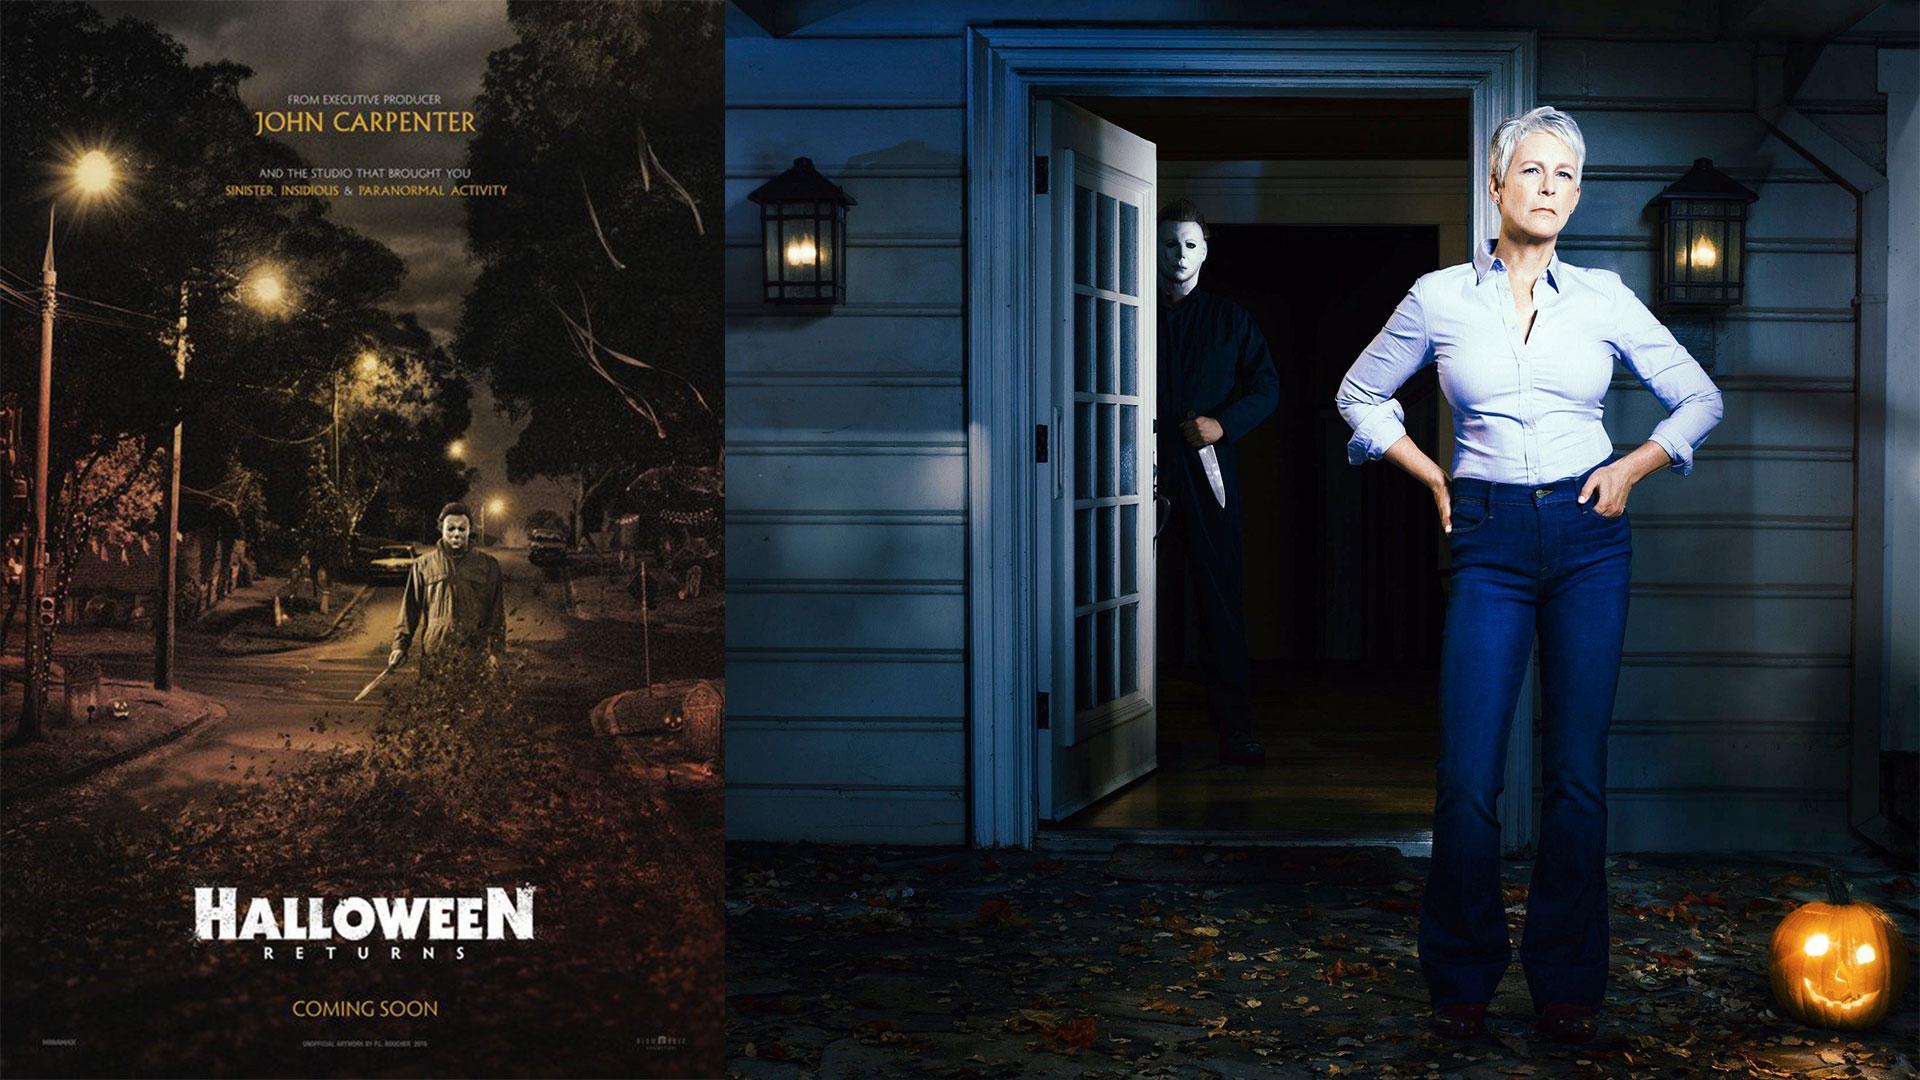 Halloween 3 movie wallpaper HD release October 2018 USA 1920x1080